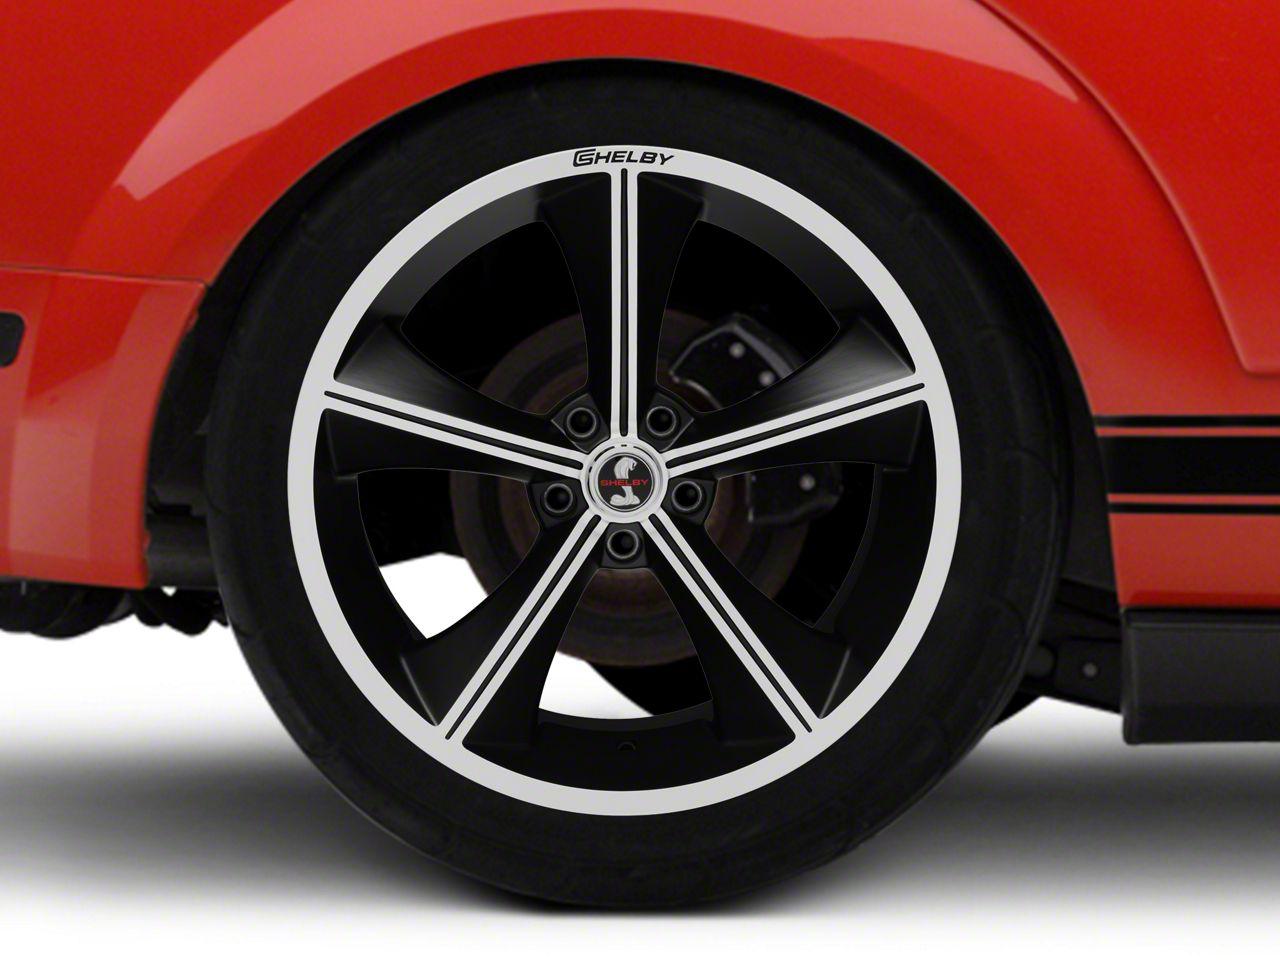 Shelby CS70 Matte Black Wheel - 20x10 - Rear Only (05-14 All)